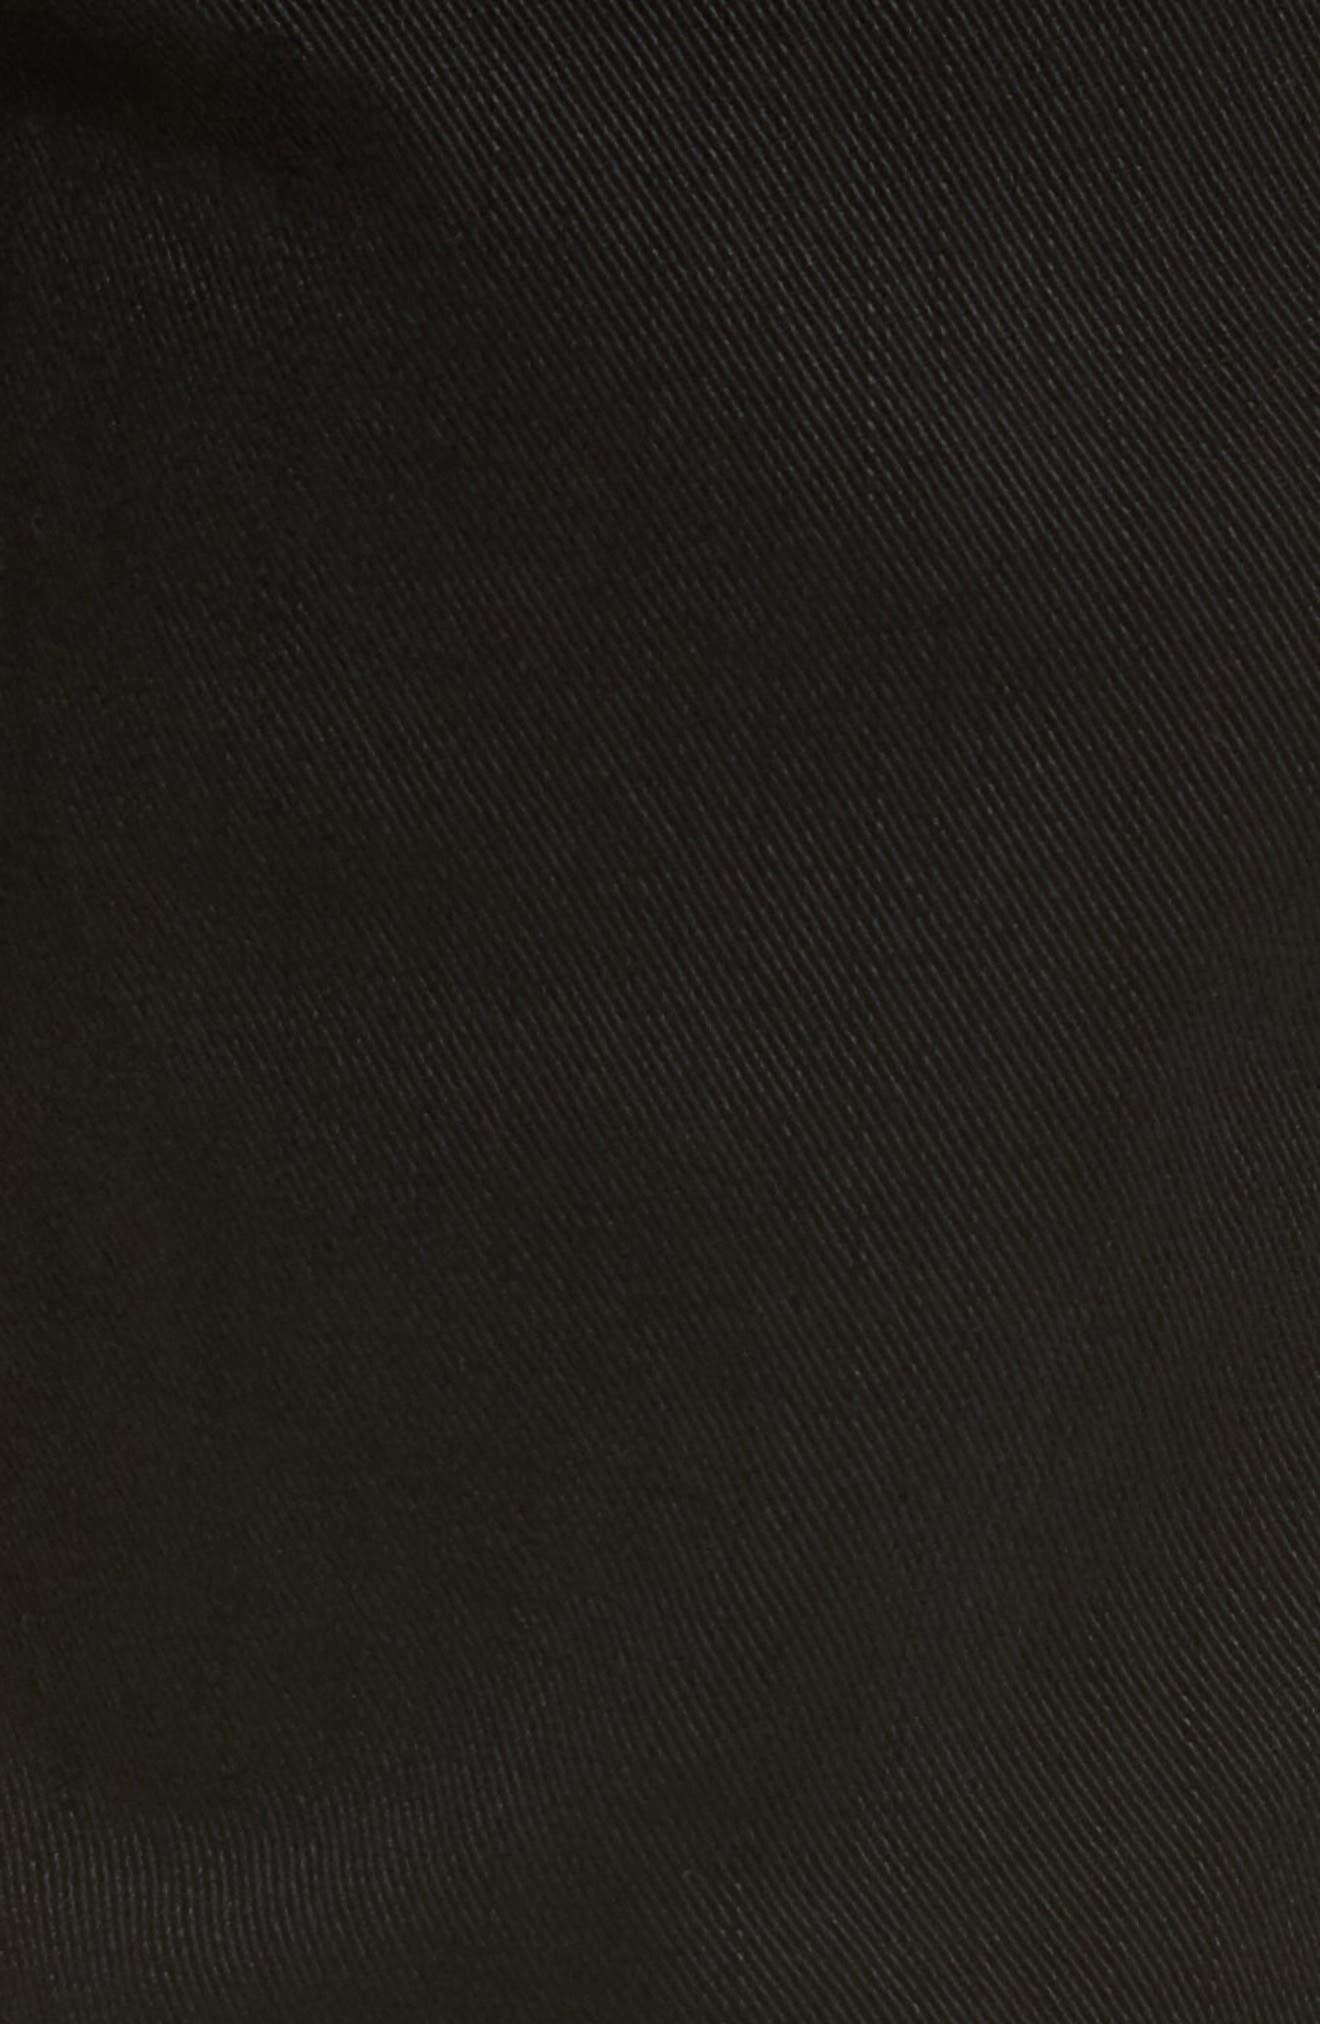 Jeans Co. Kingston Slim Straight Leg Jeans,                             Alternate thumbnail 5, color,                             Black Rinse